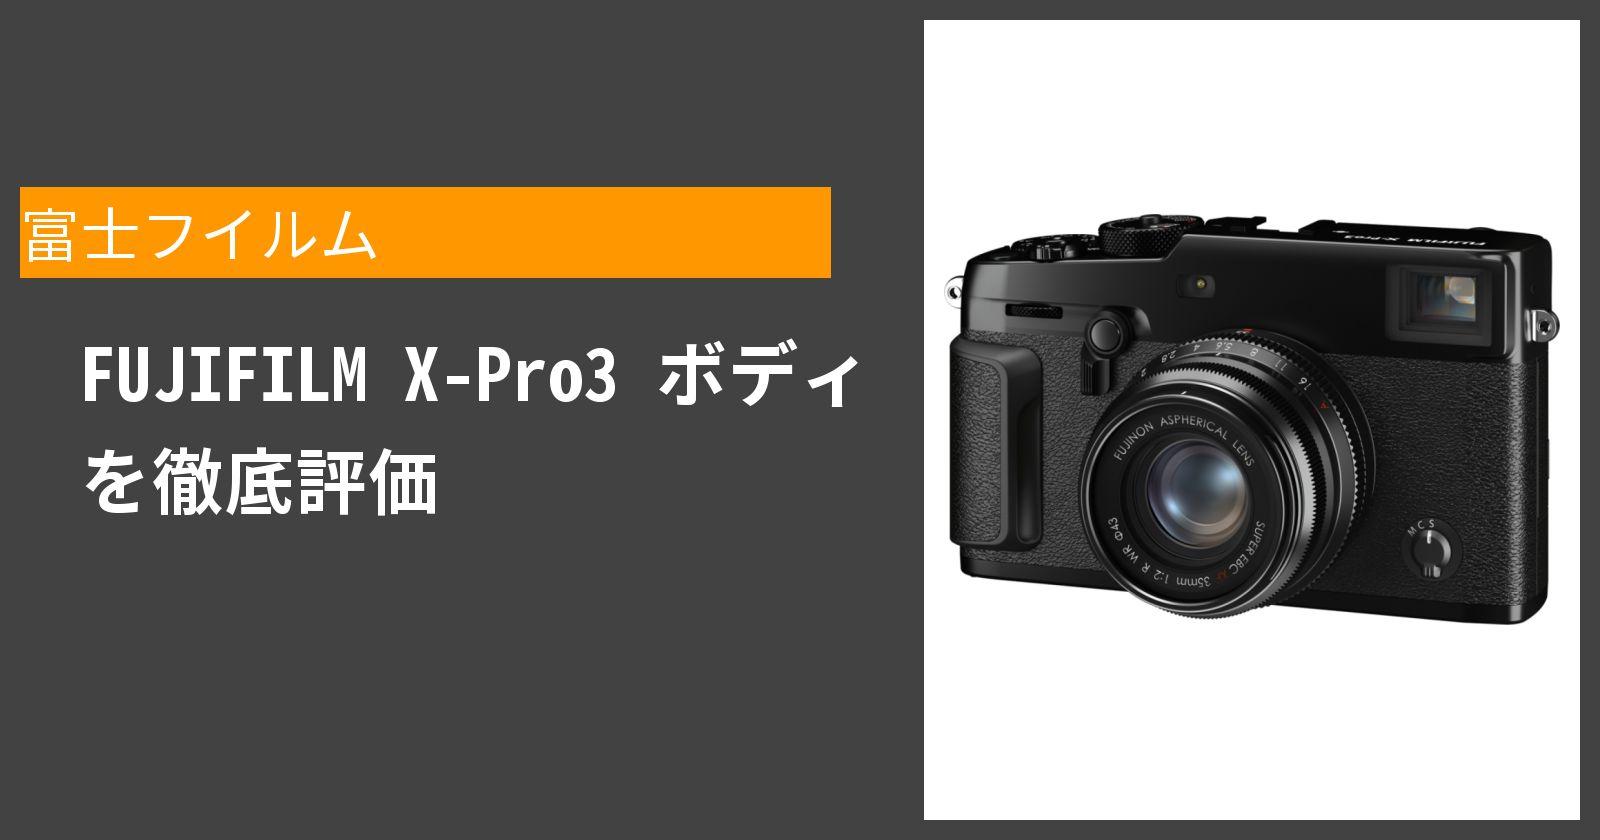 FUJIFILM X-Pro3 ボディを徹底評価